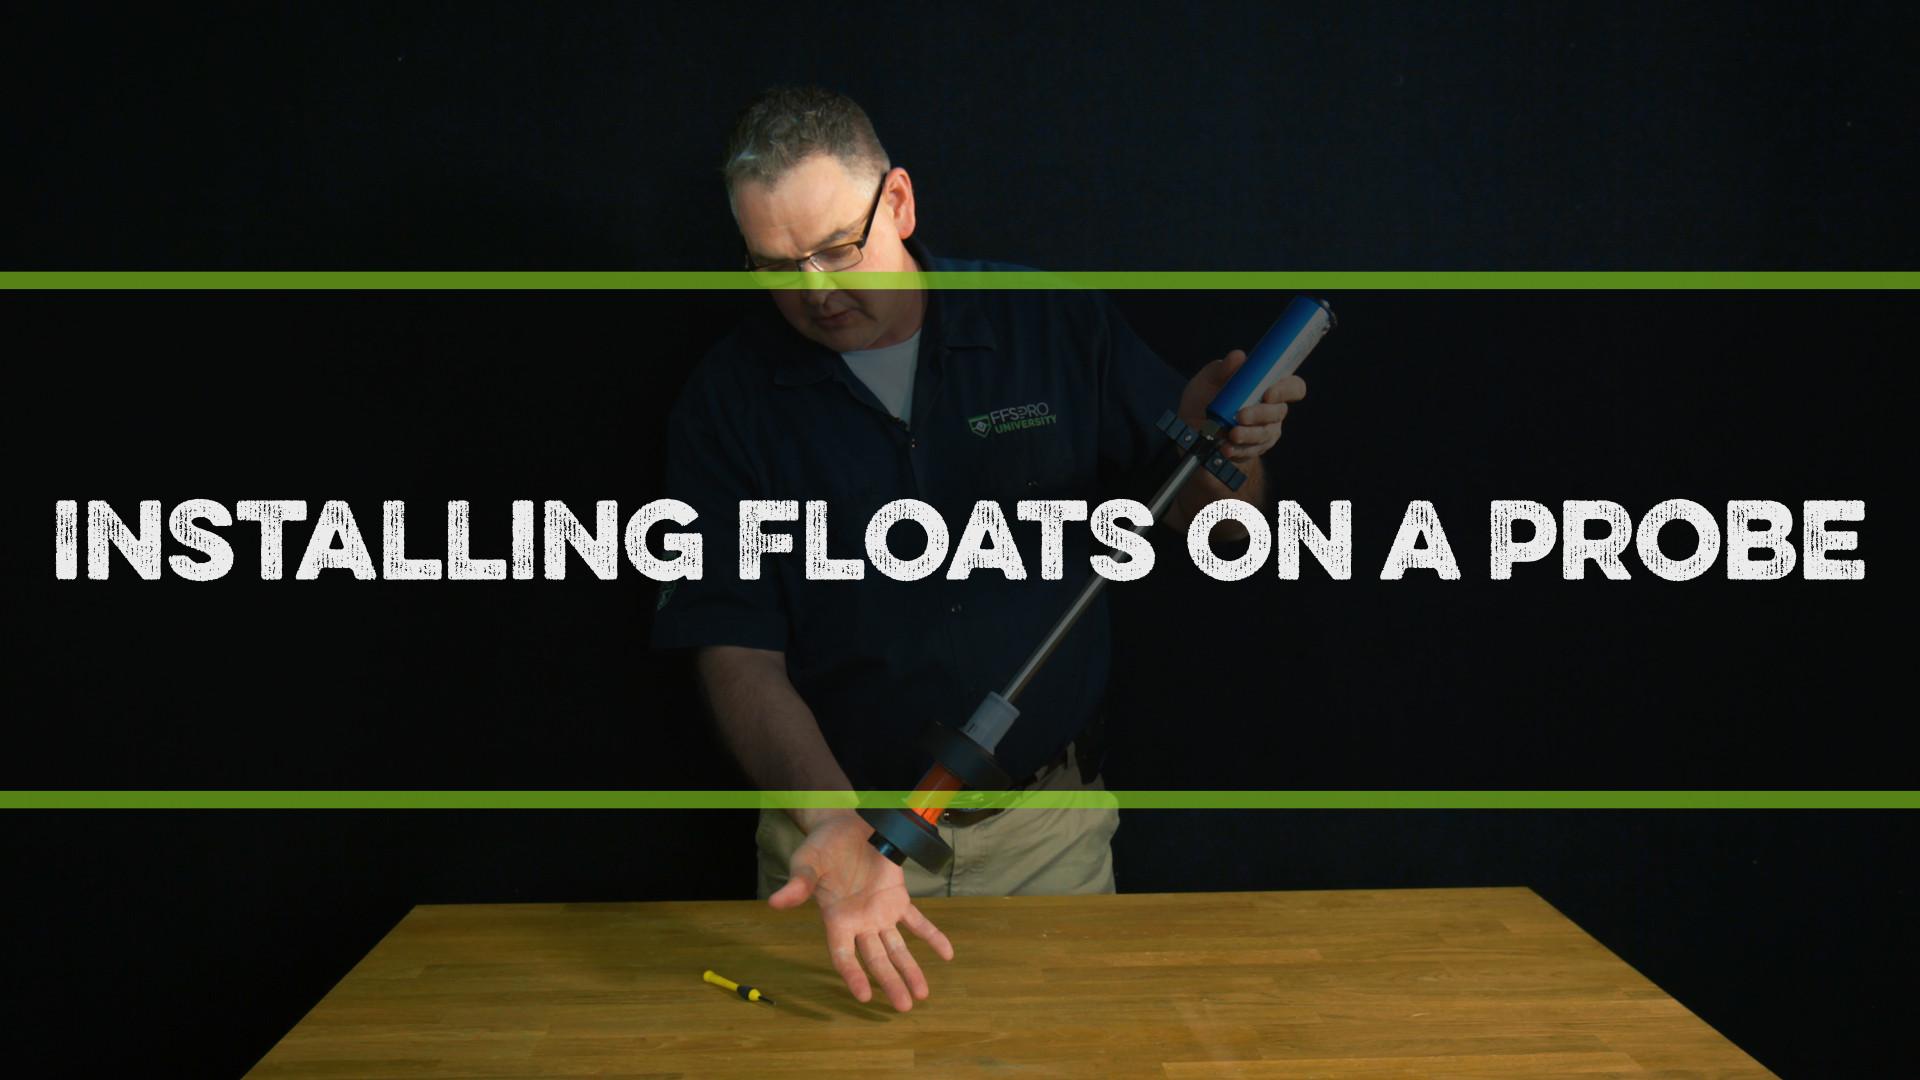 FFS Pro Installing Floats on a Probe Video